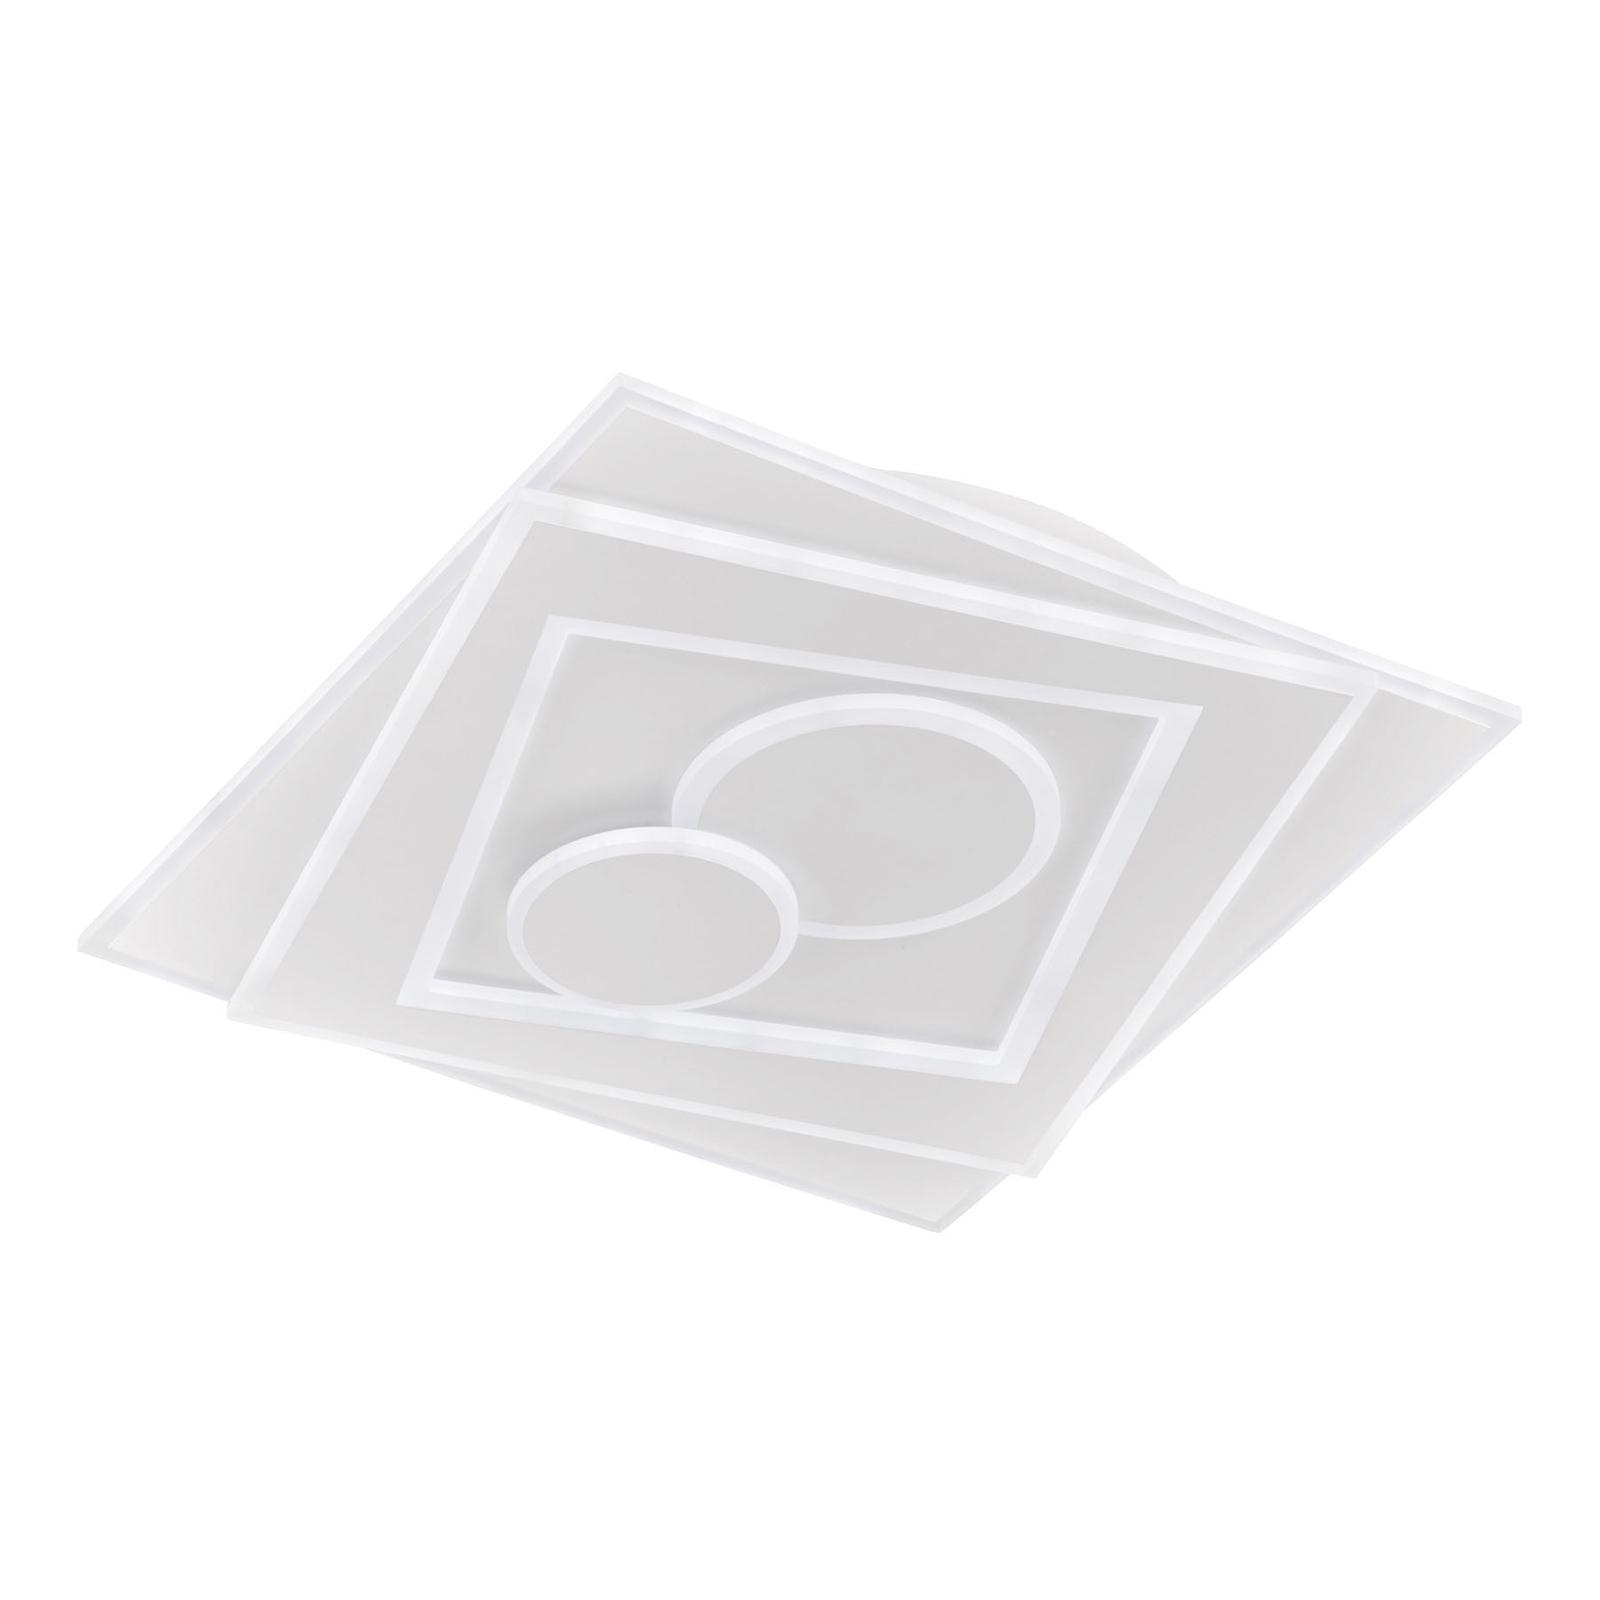 LED-Deckenleuchte Ratio, dimmbar, zwei Kreise